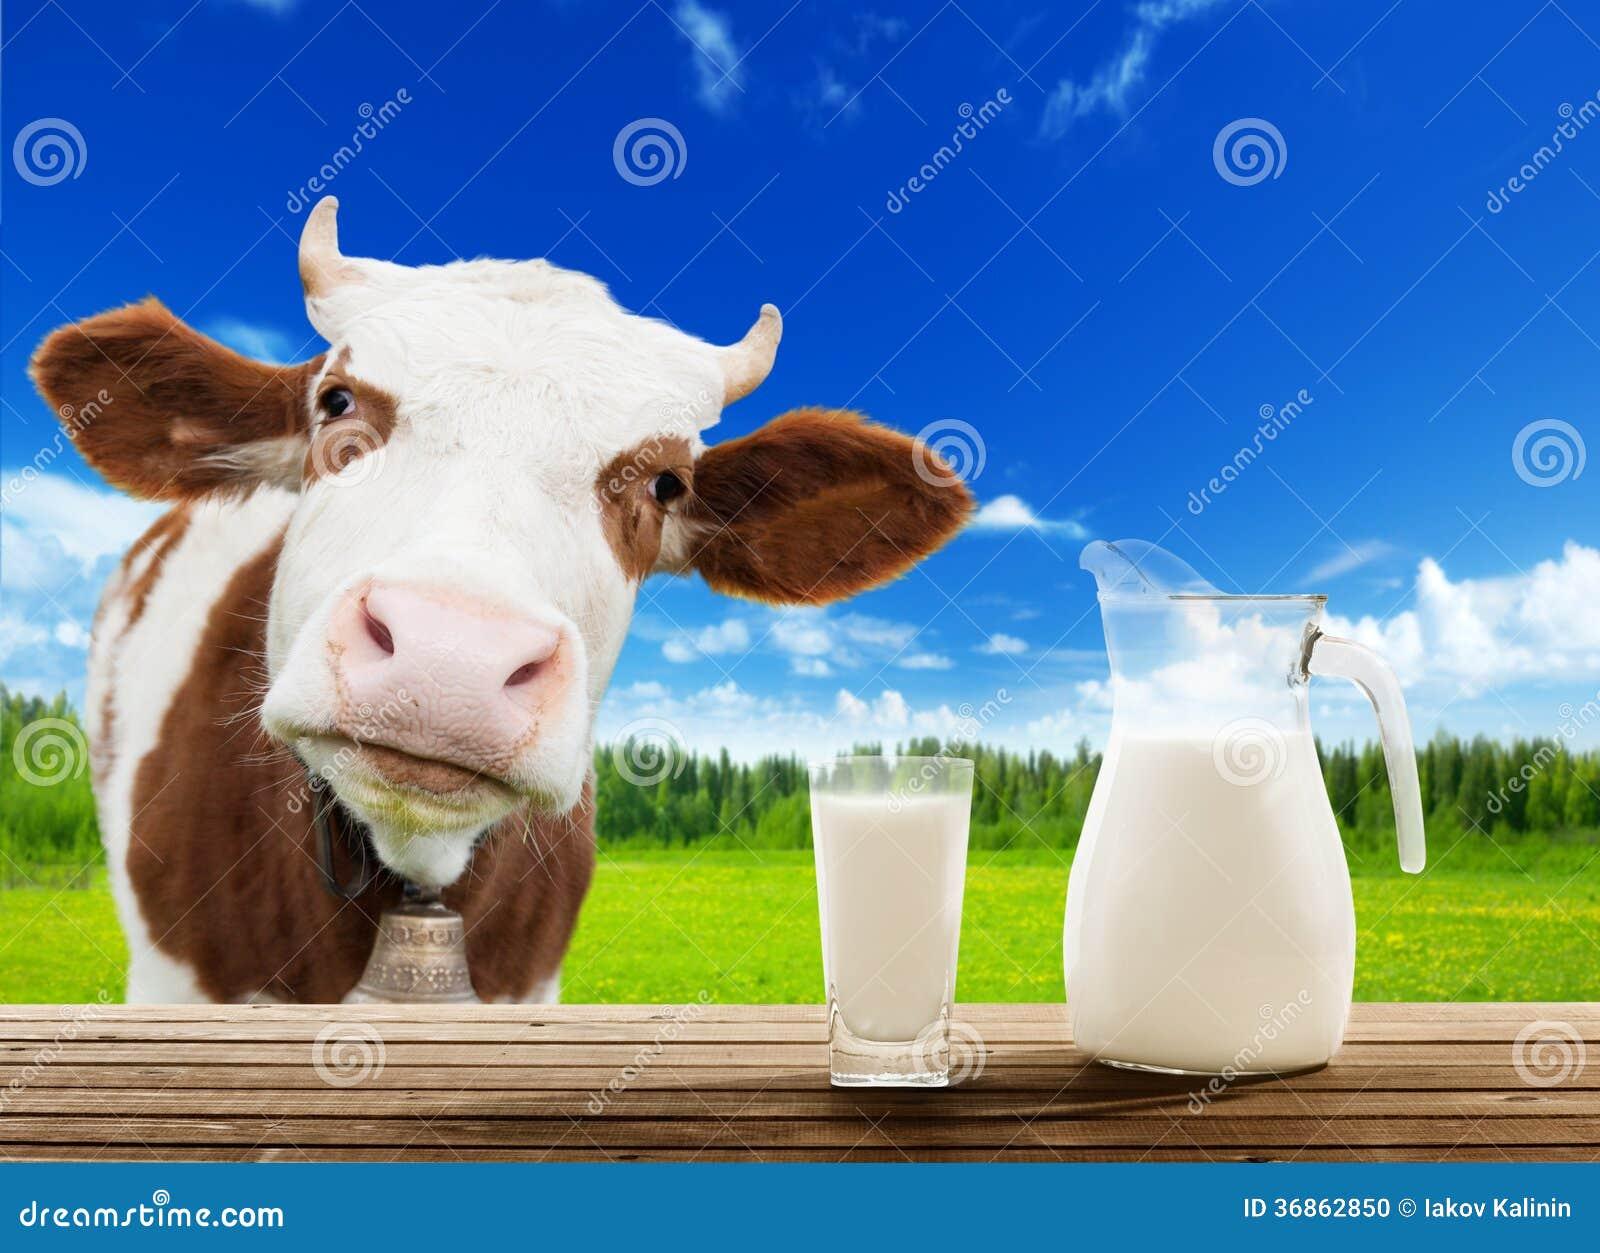 Mucca e latte